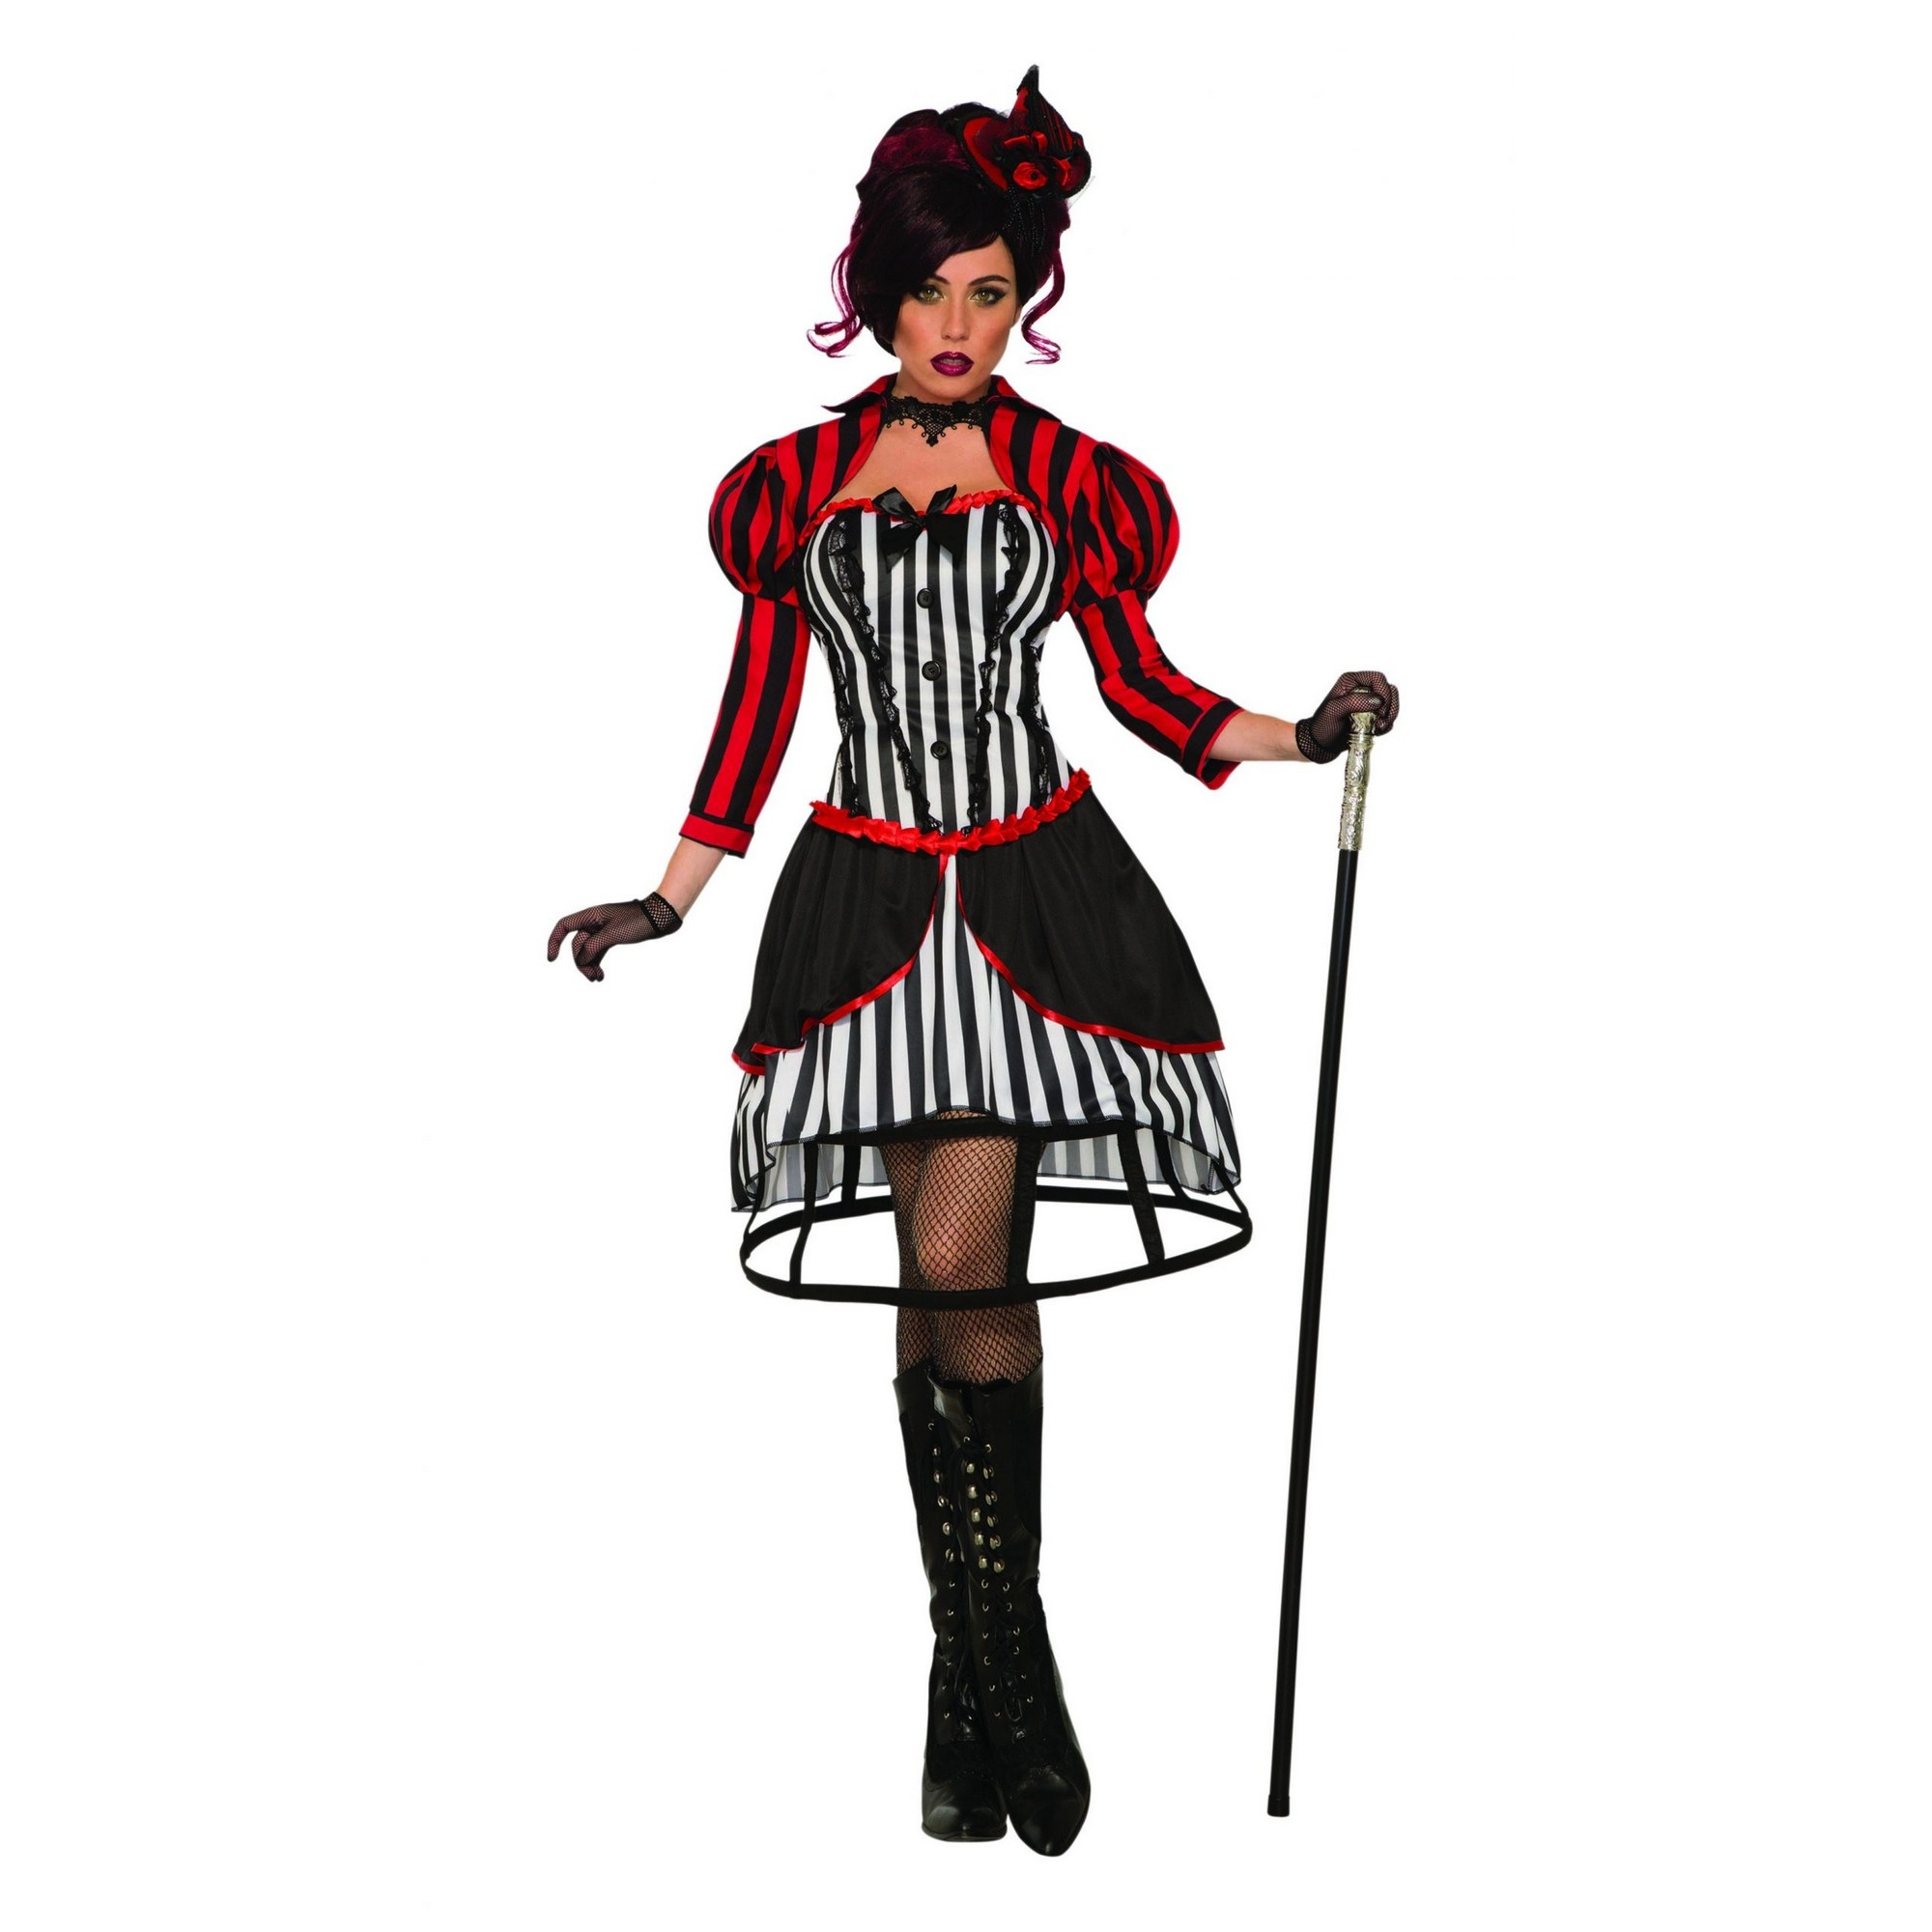 Bristol Novelty Womens/Ladies Mystery Circus Madame Costume (10-14 UK) (Black/Red/White)